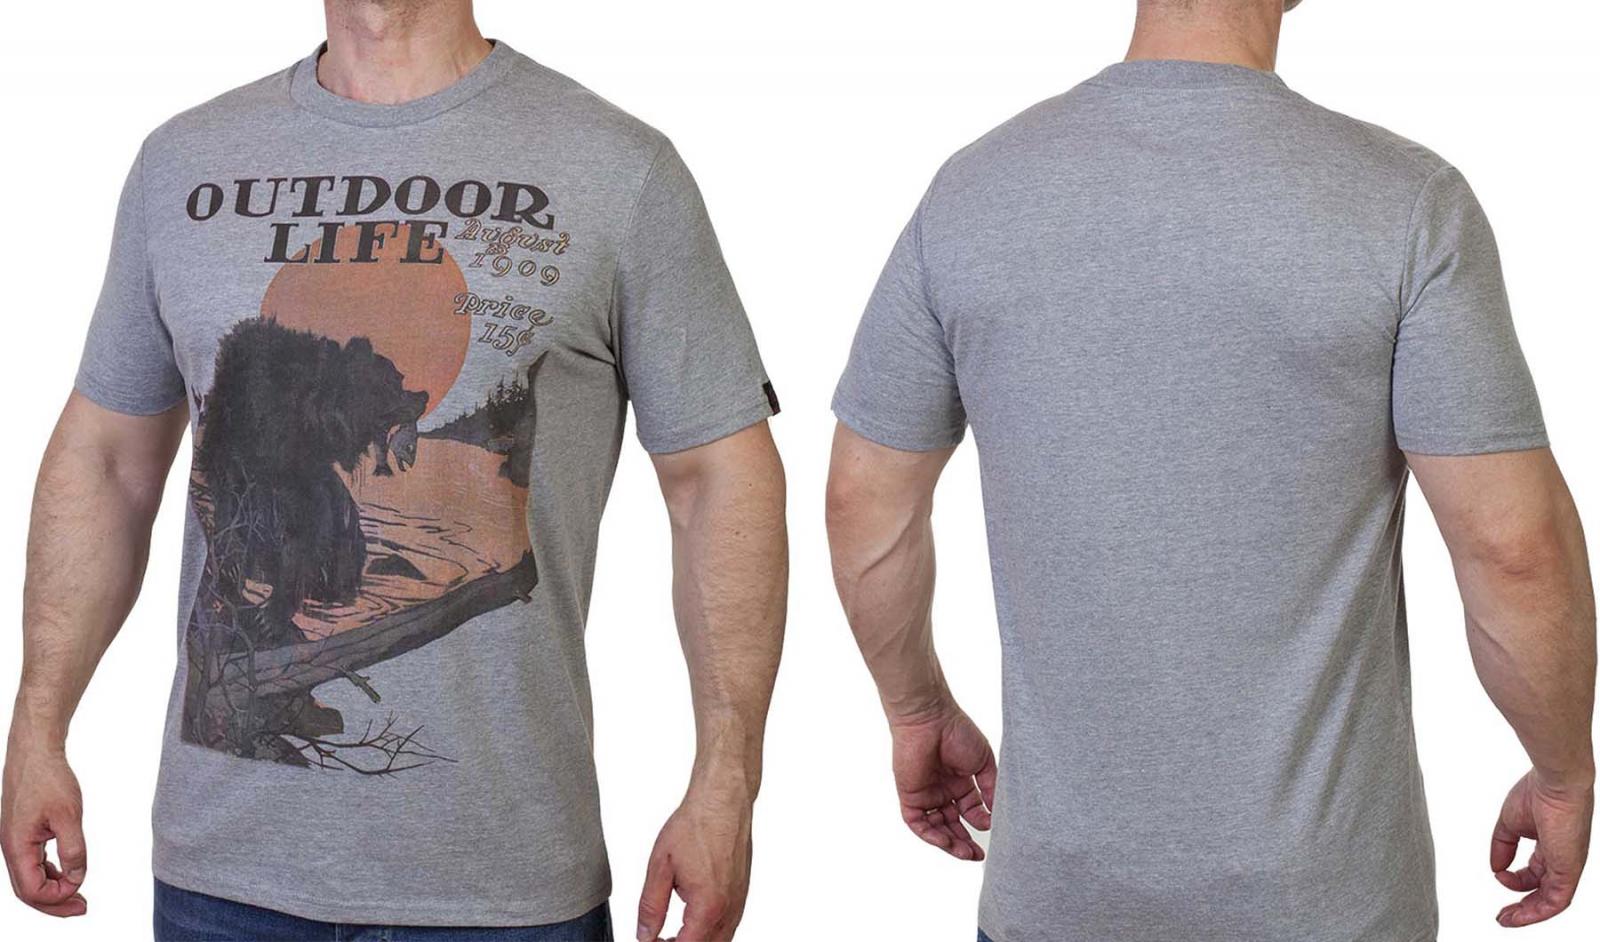 Мужская фирменная футболка Guide Life.